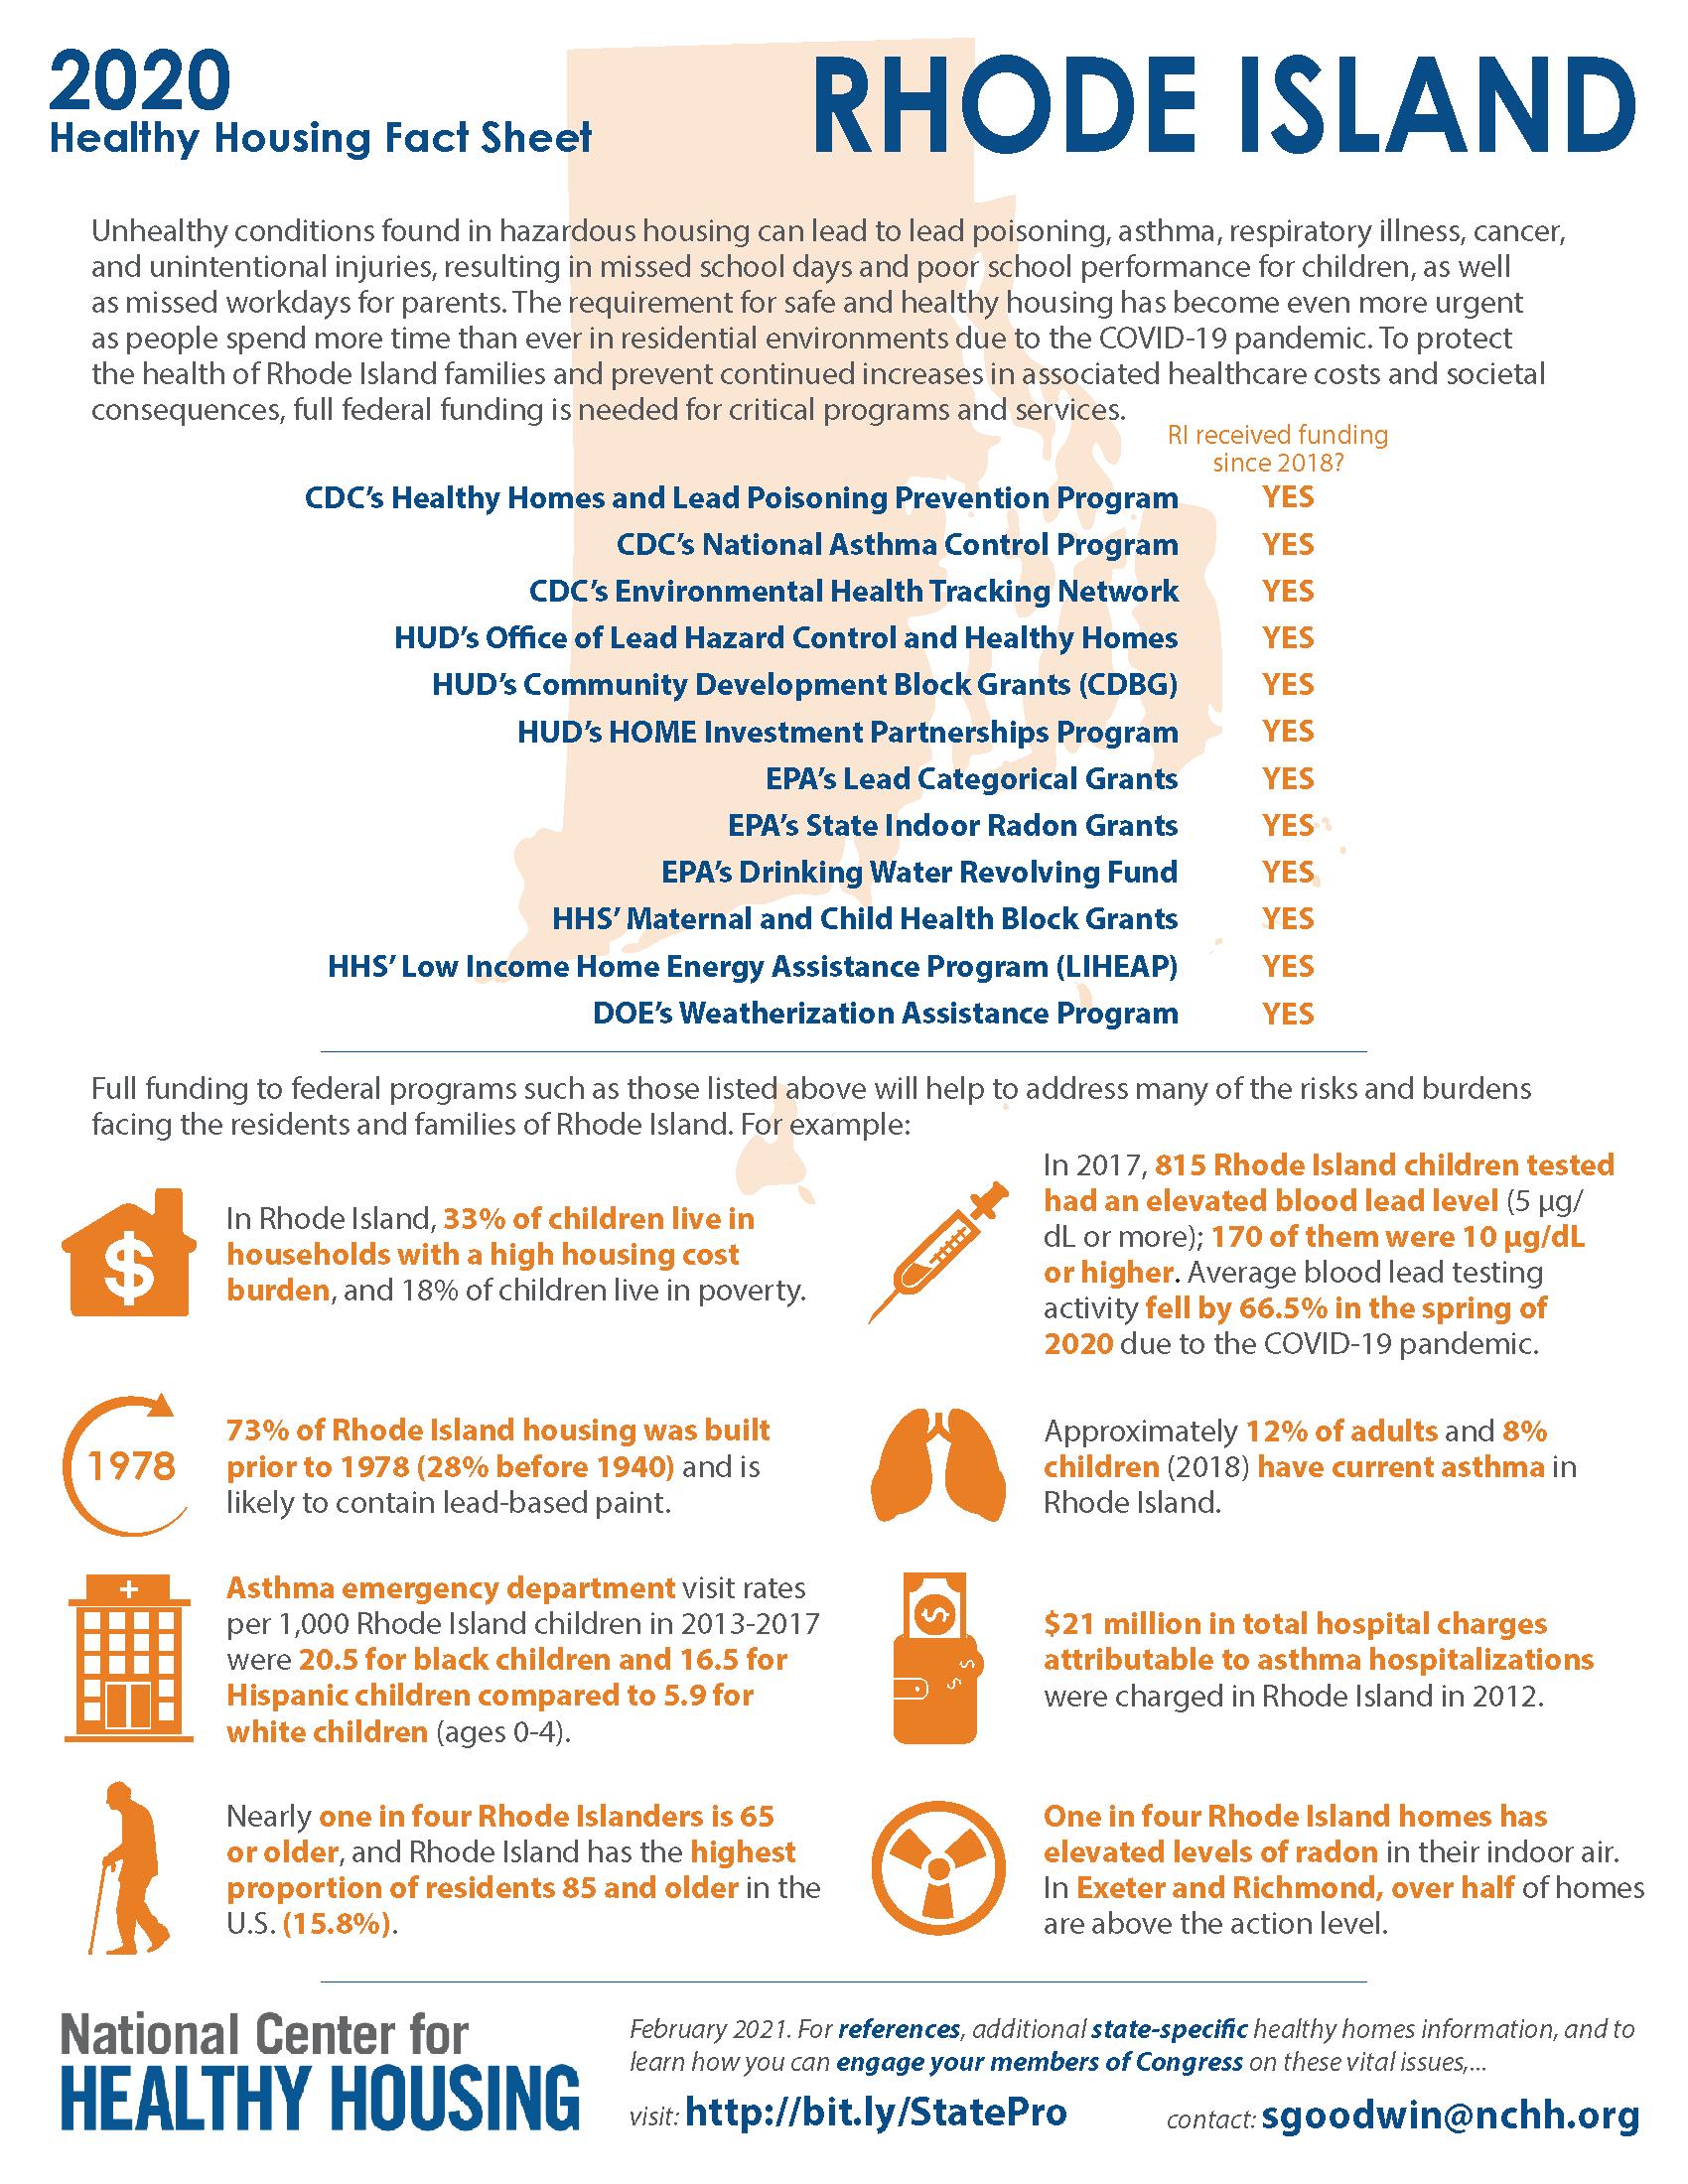 Healthy Housing Fact Sheet - Rhode Island 2020